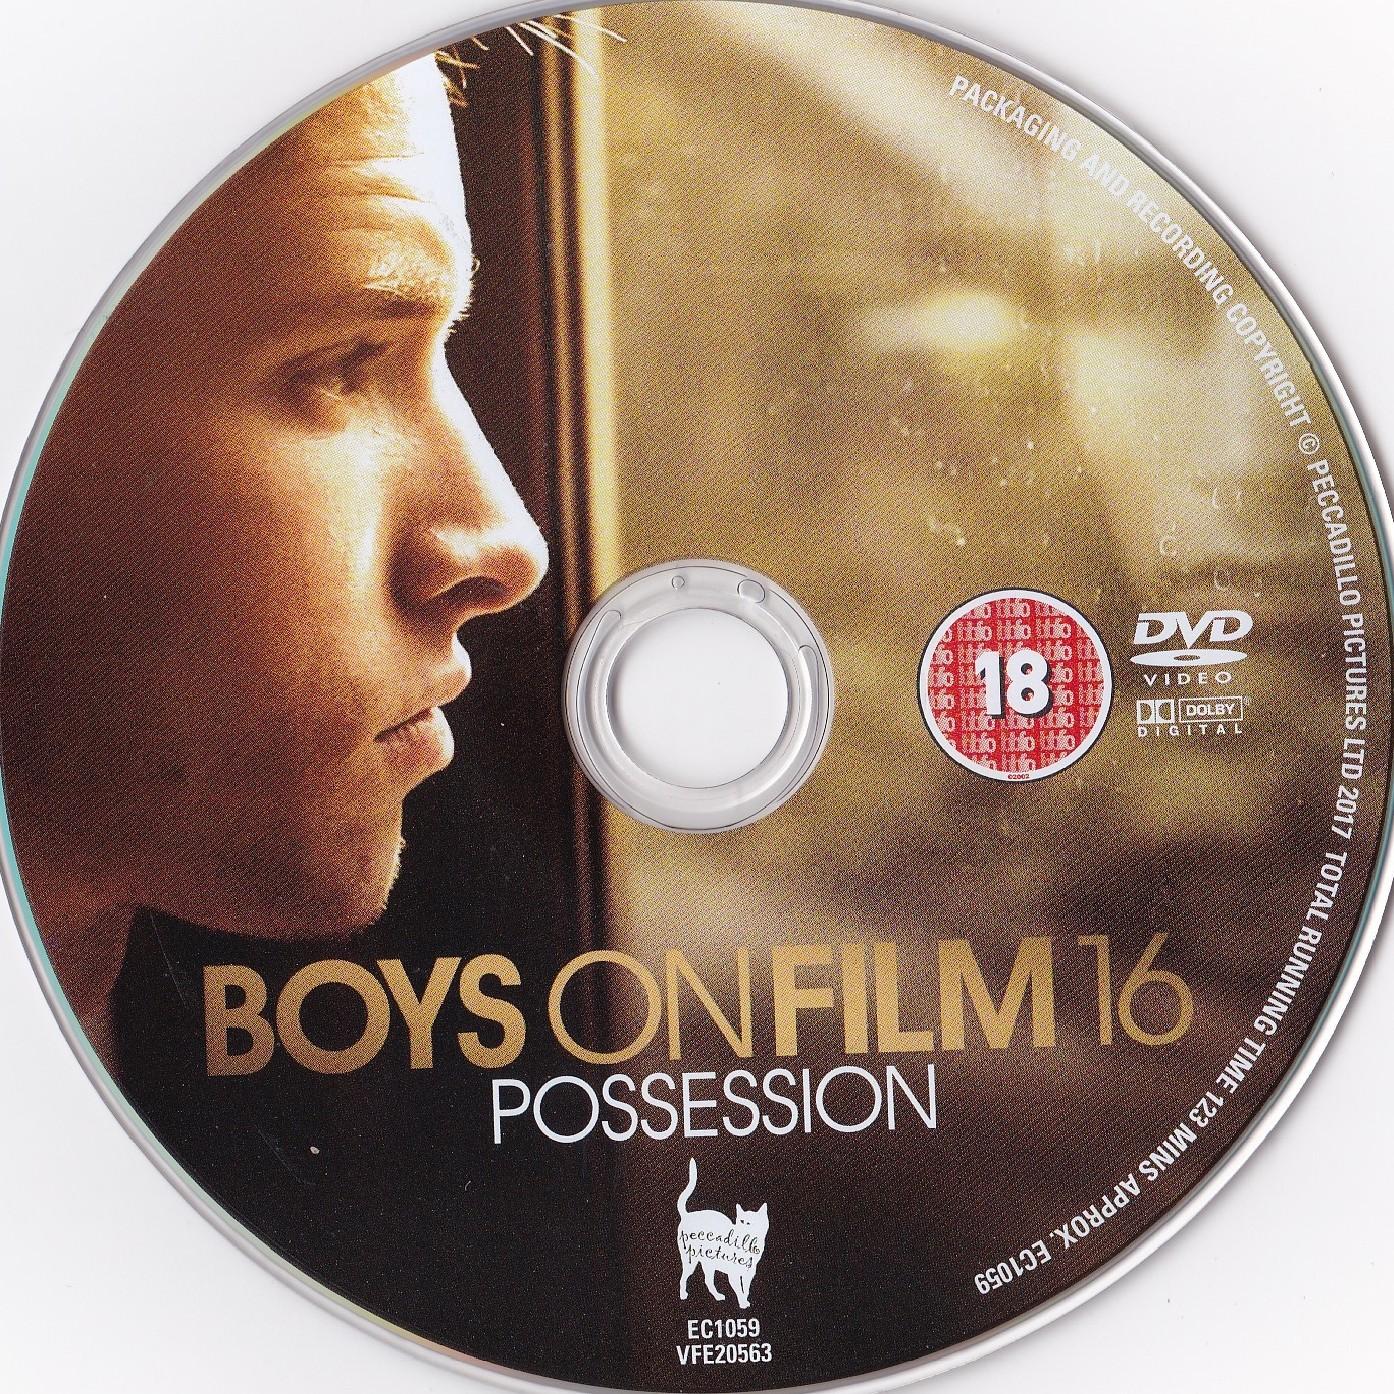 Boys On Film 16 Possession (2017) DVD